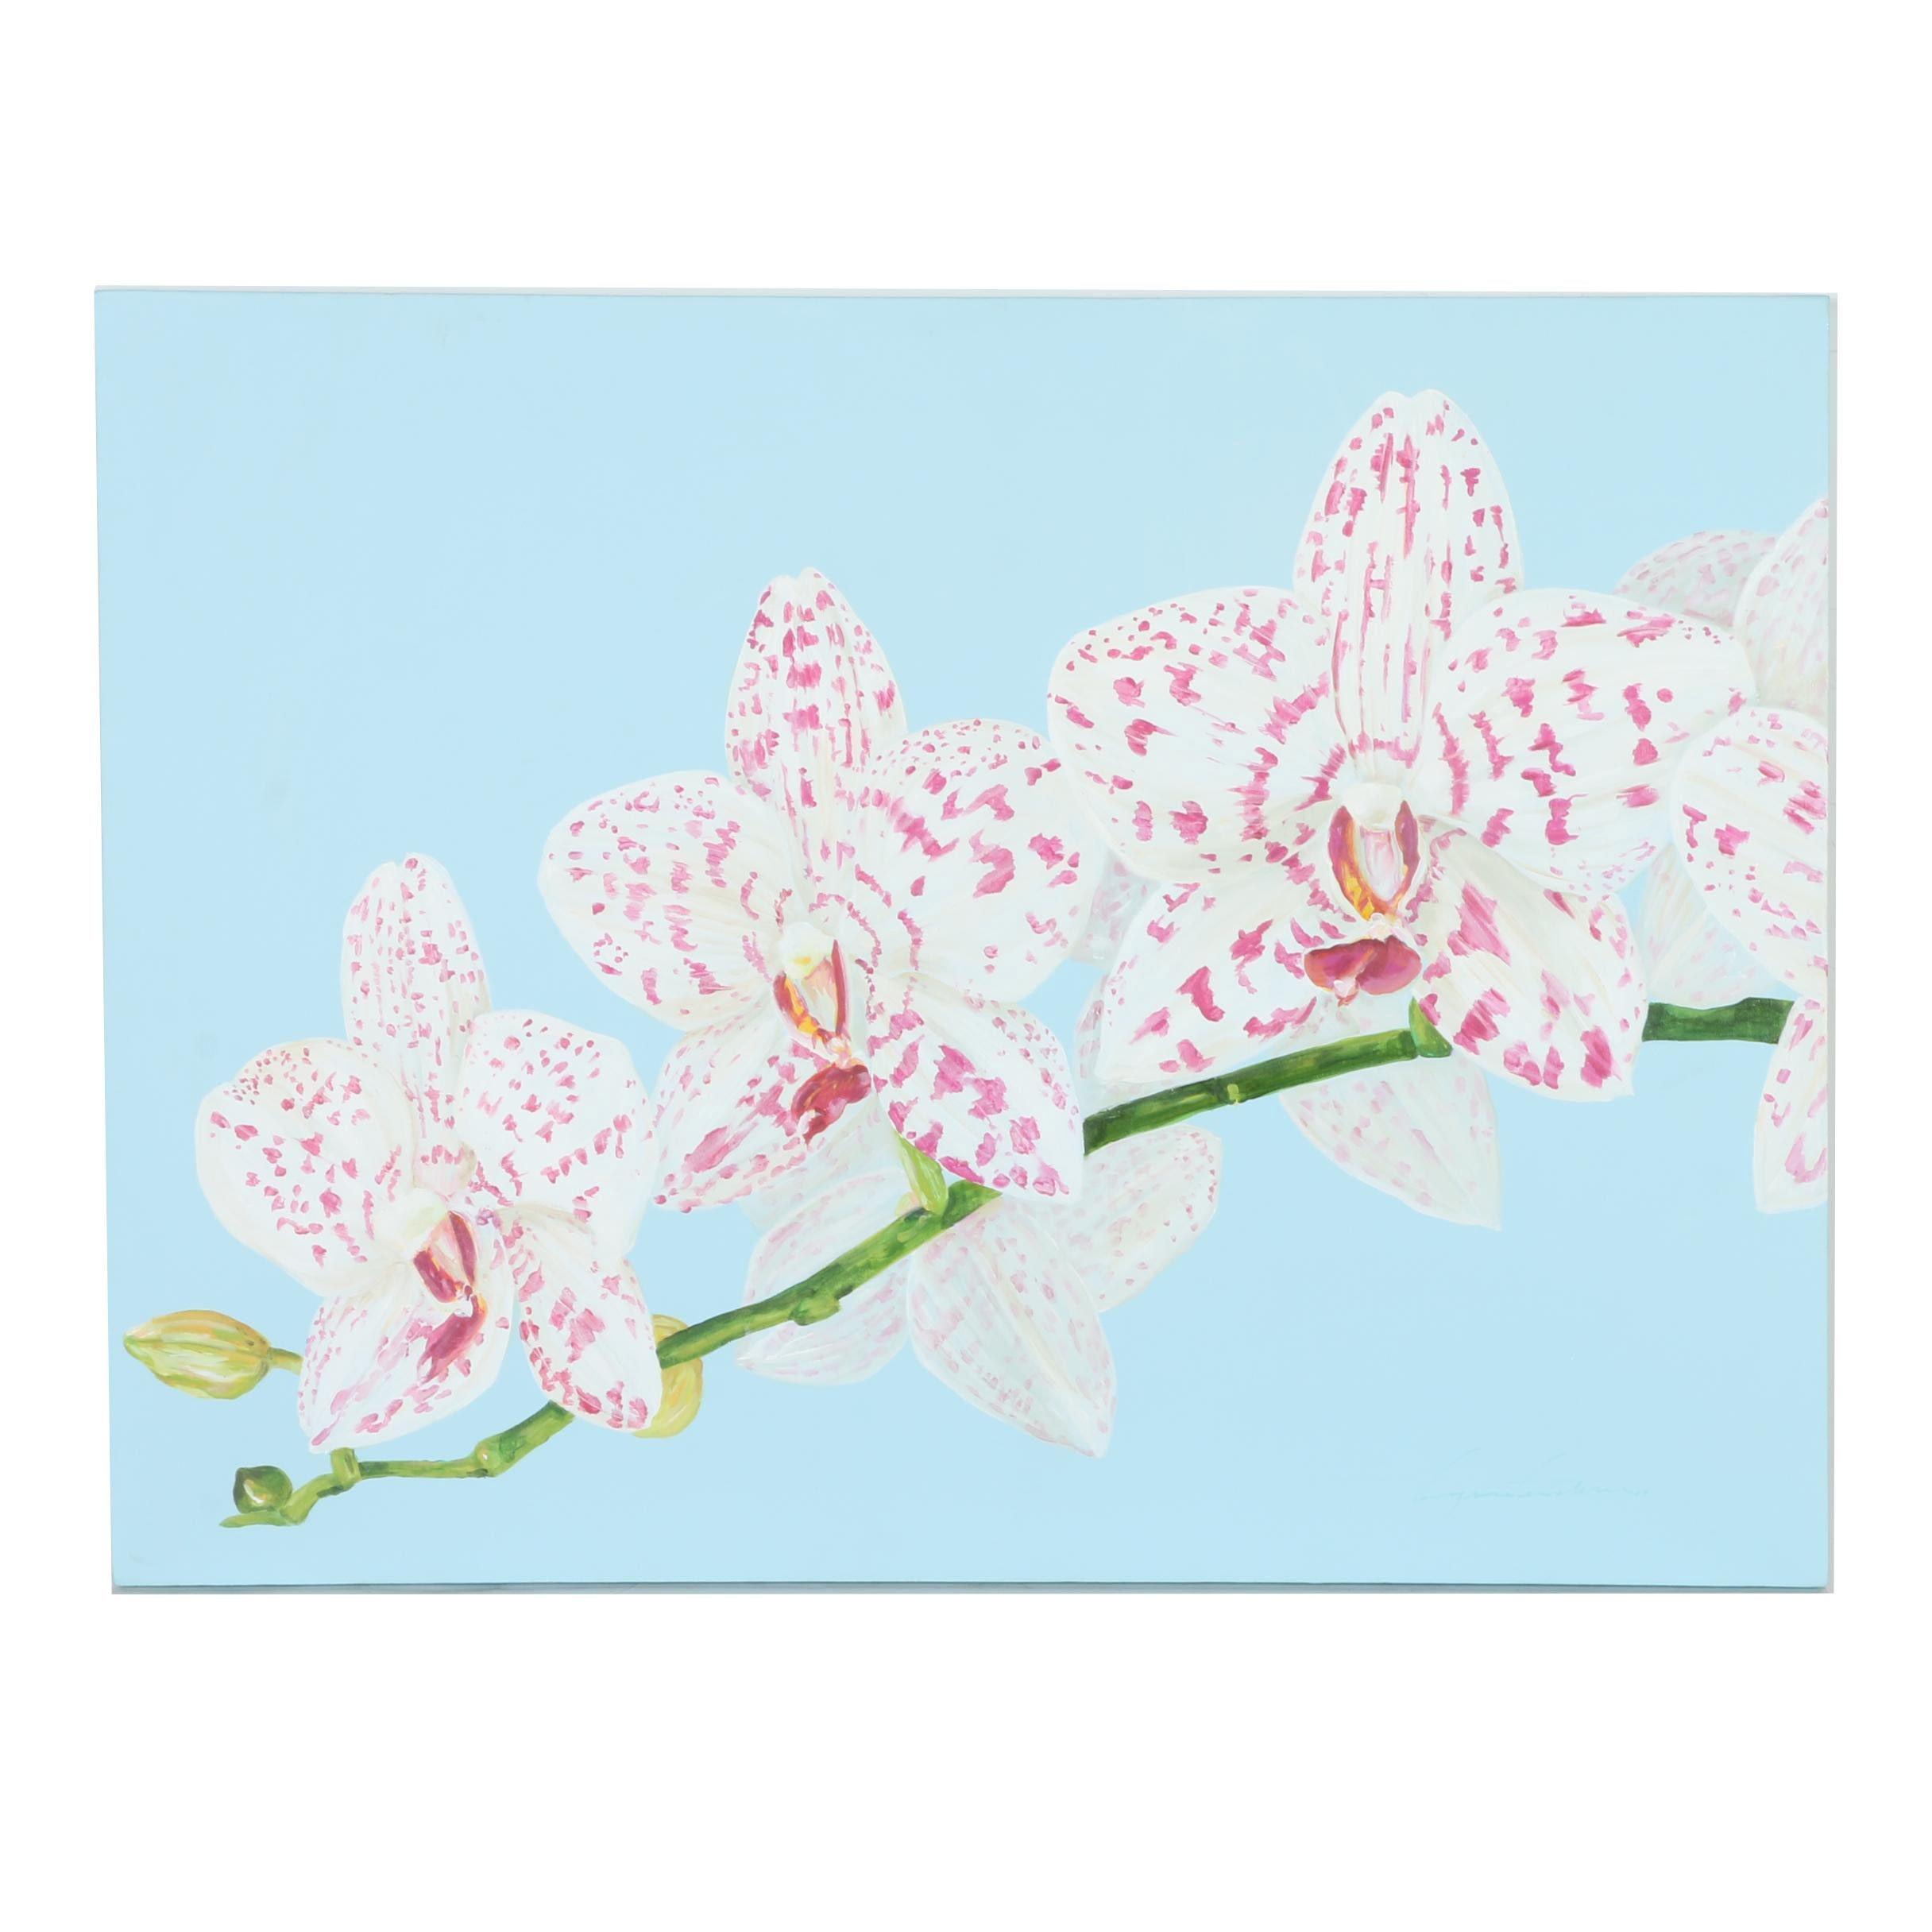 Original Acrylic Painting Of Flowers